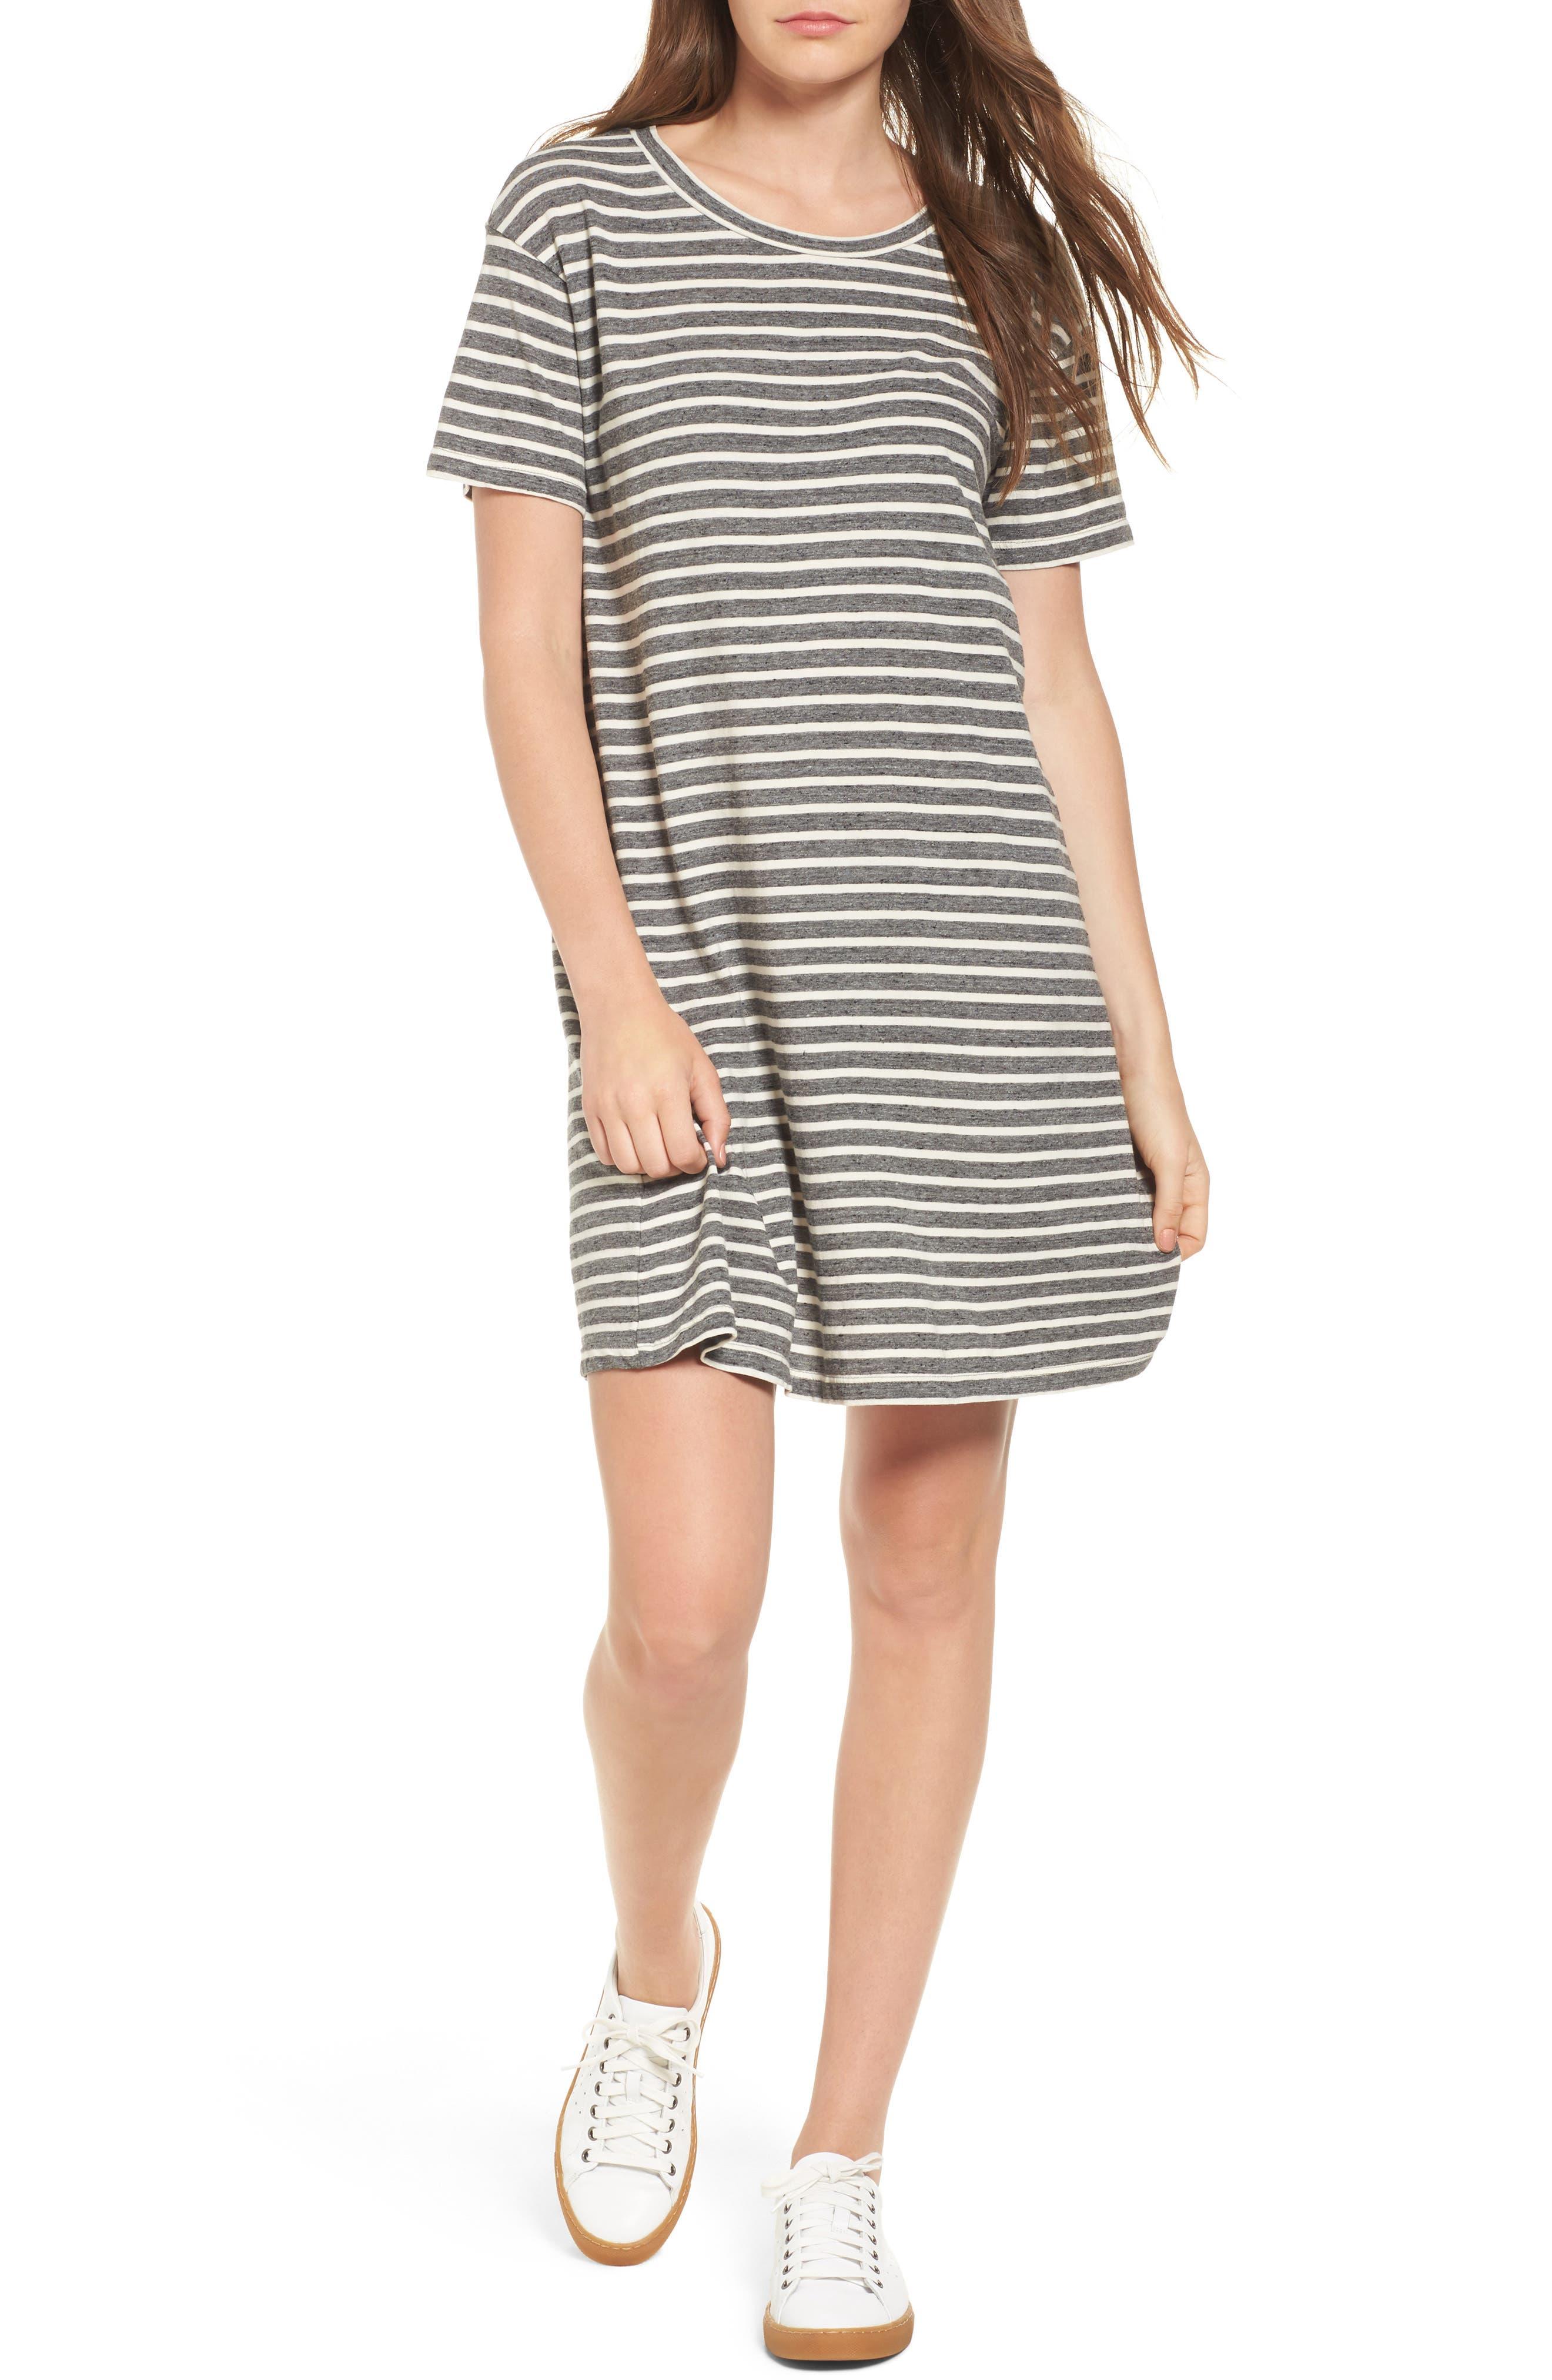 Stripe Knit T-Shirt Dress,                             Main thumbnail 1, color,                             Charcoal Anchor Stripe